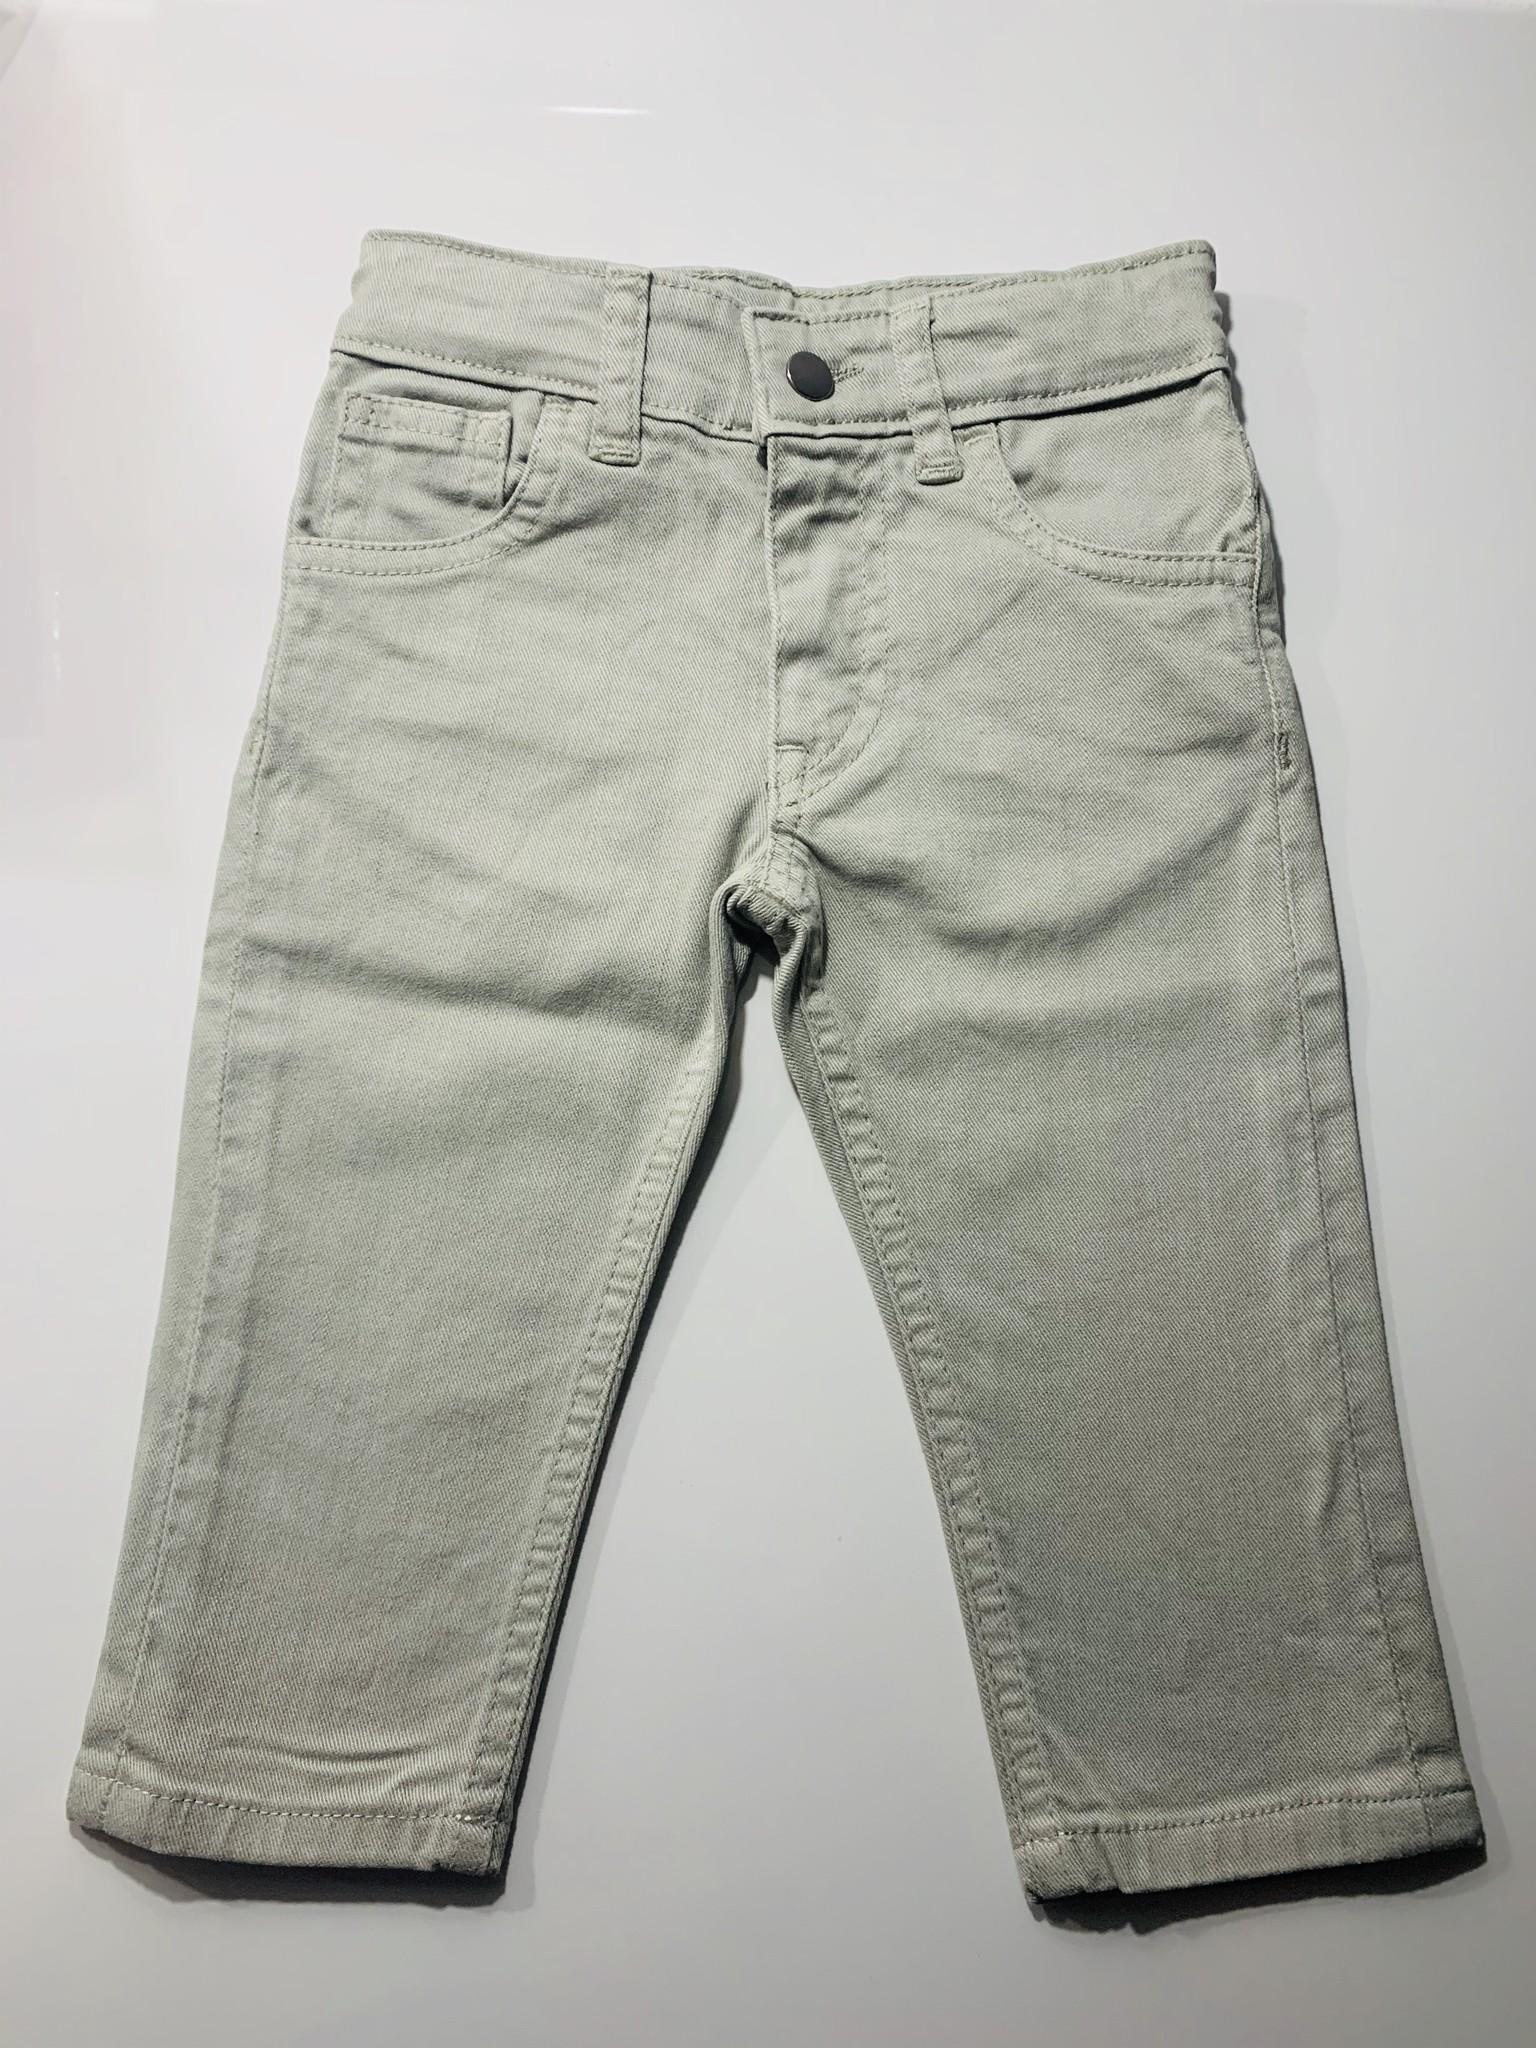 Patachou Patachou Boys Soft Jeans